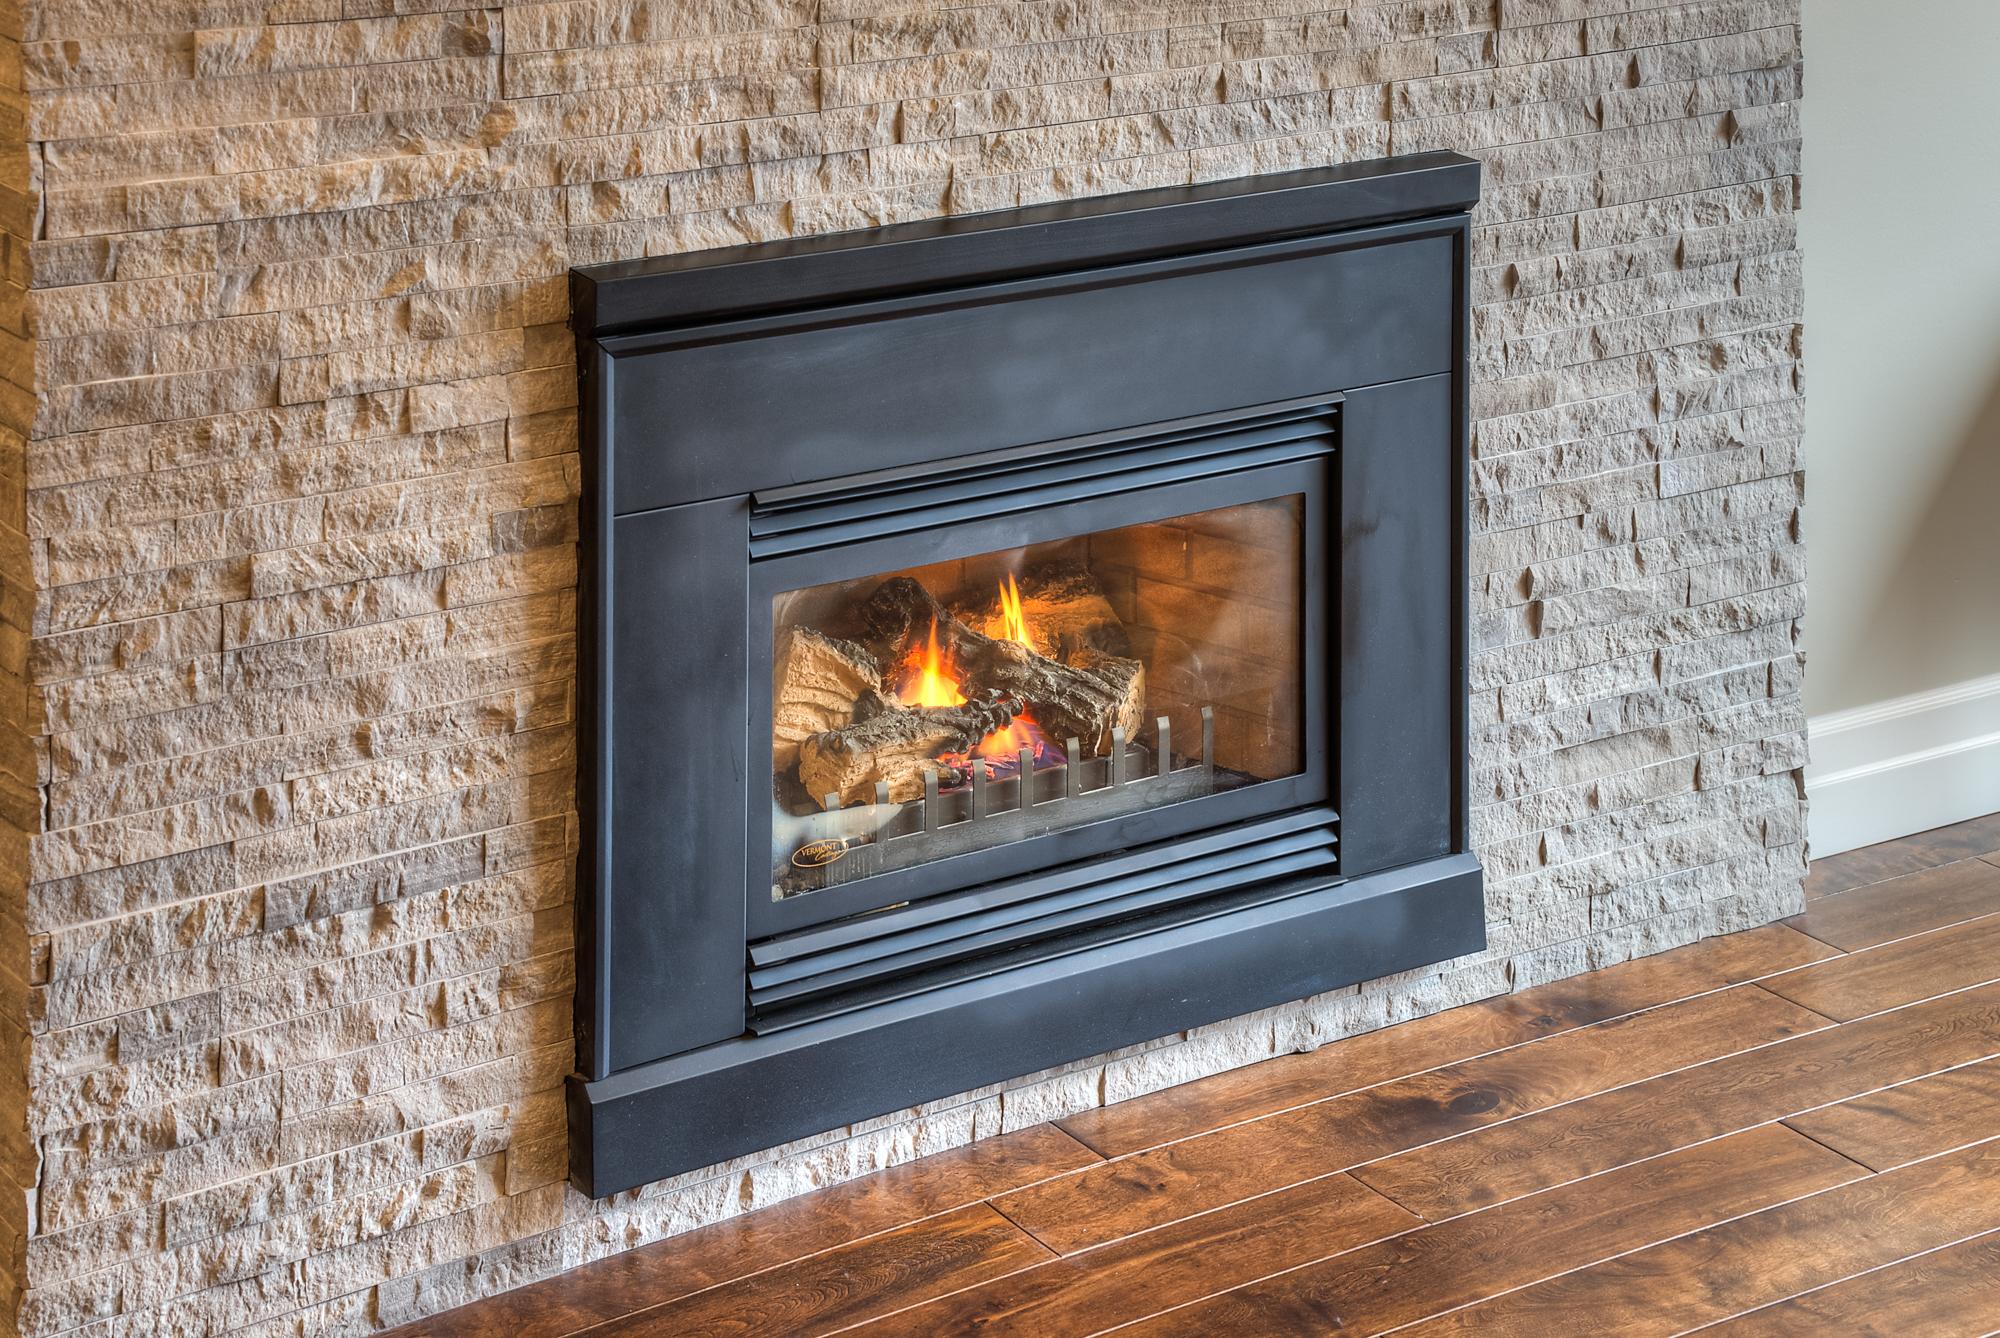 Stone veneer fireplace